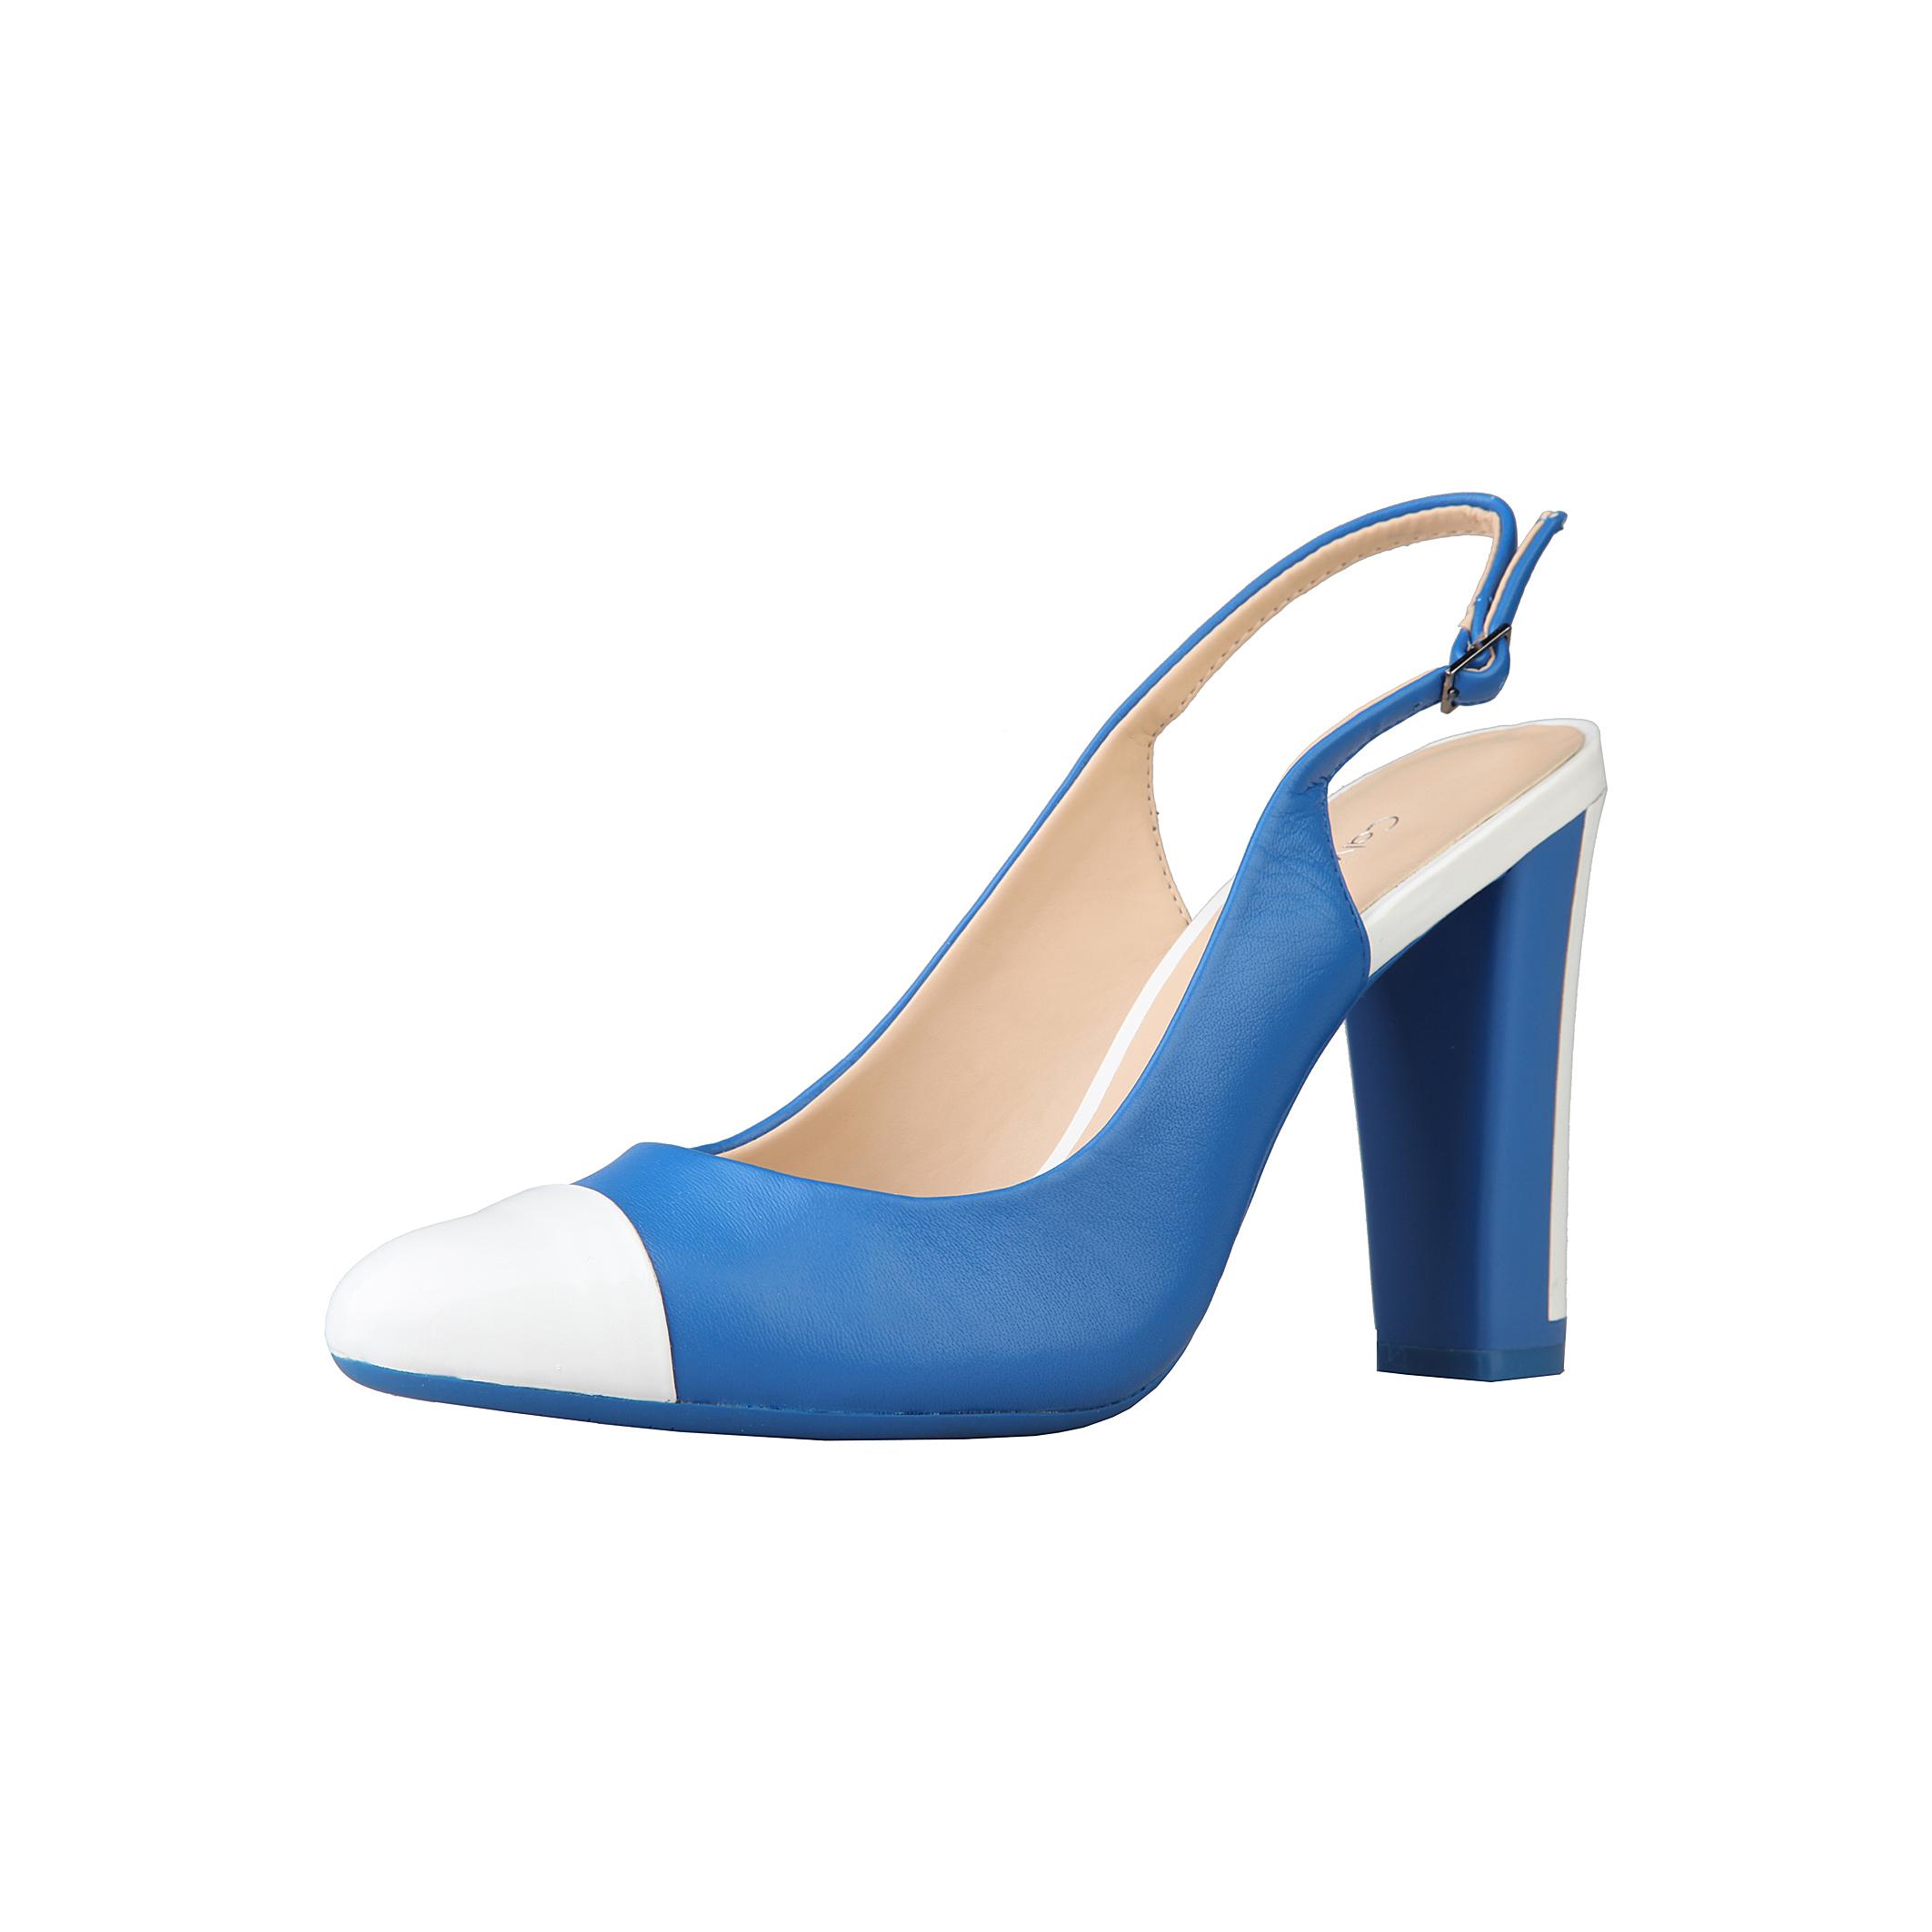 Sandali-Calvin-Klein-N11364-Donna-Blu-59326 miniatura 2